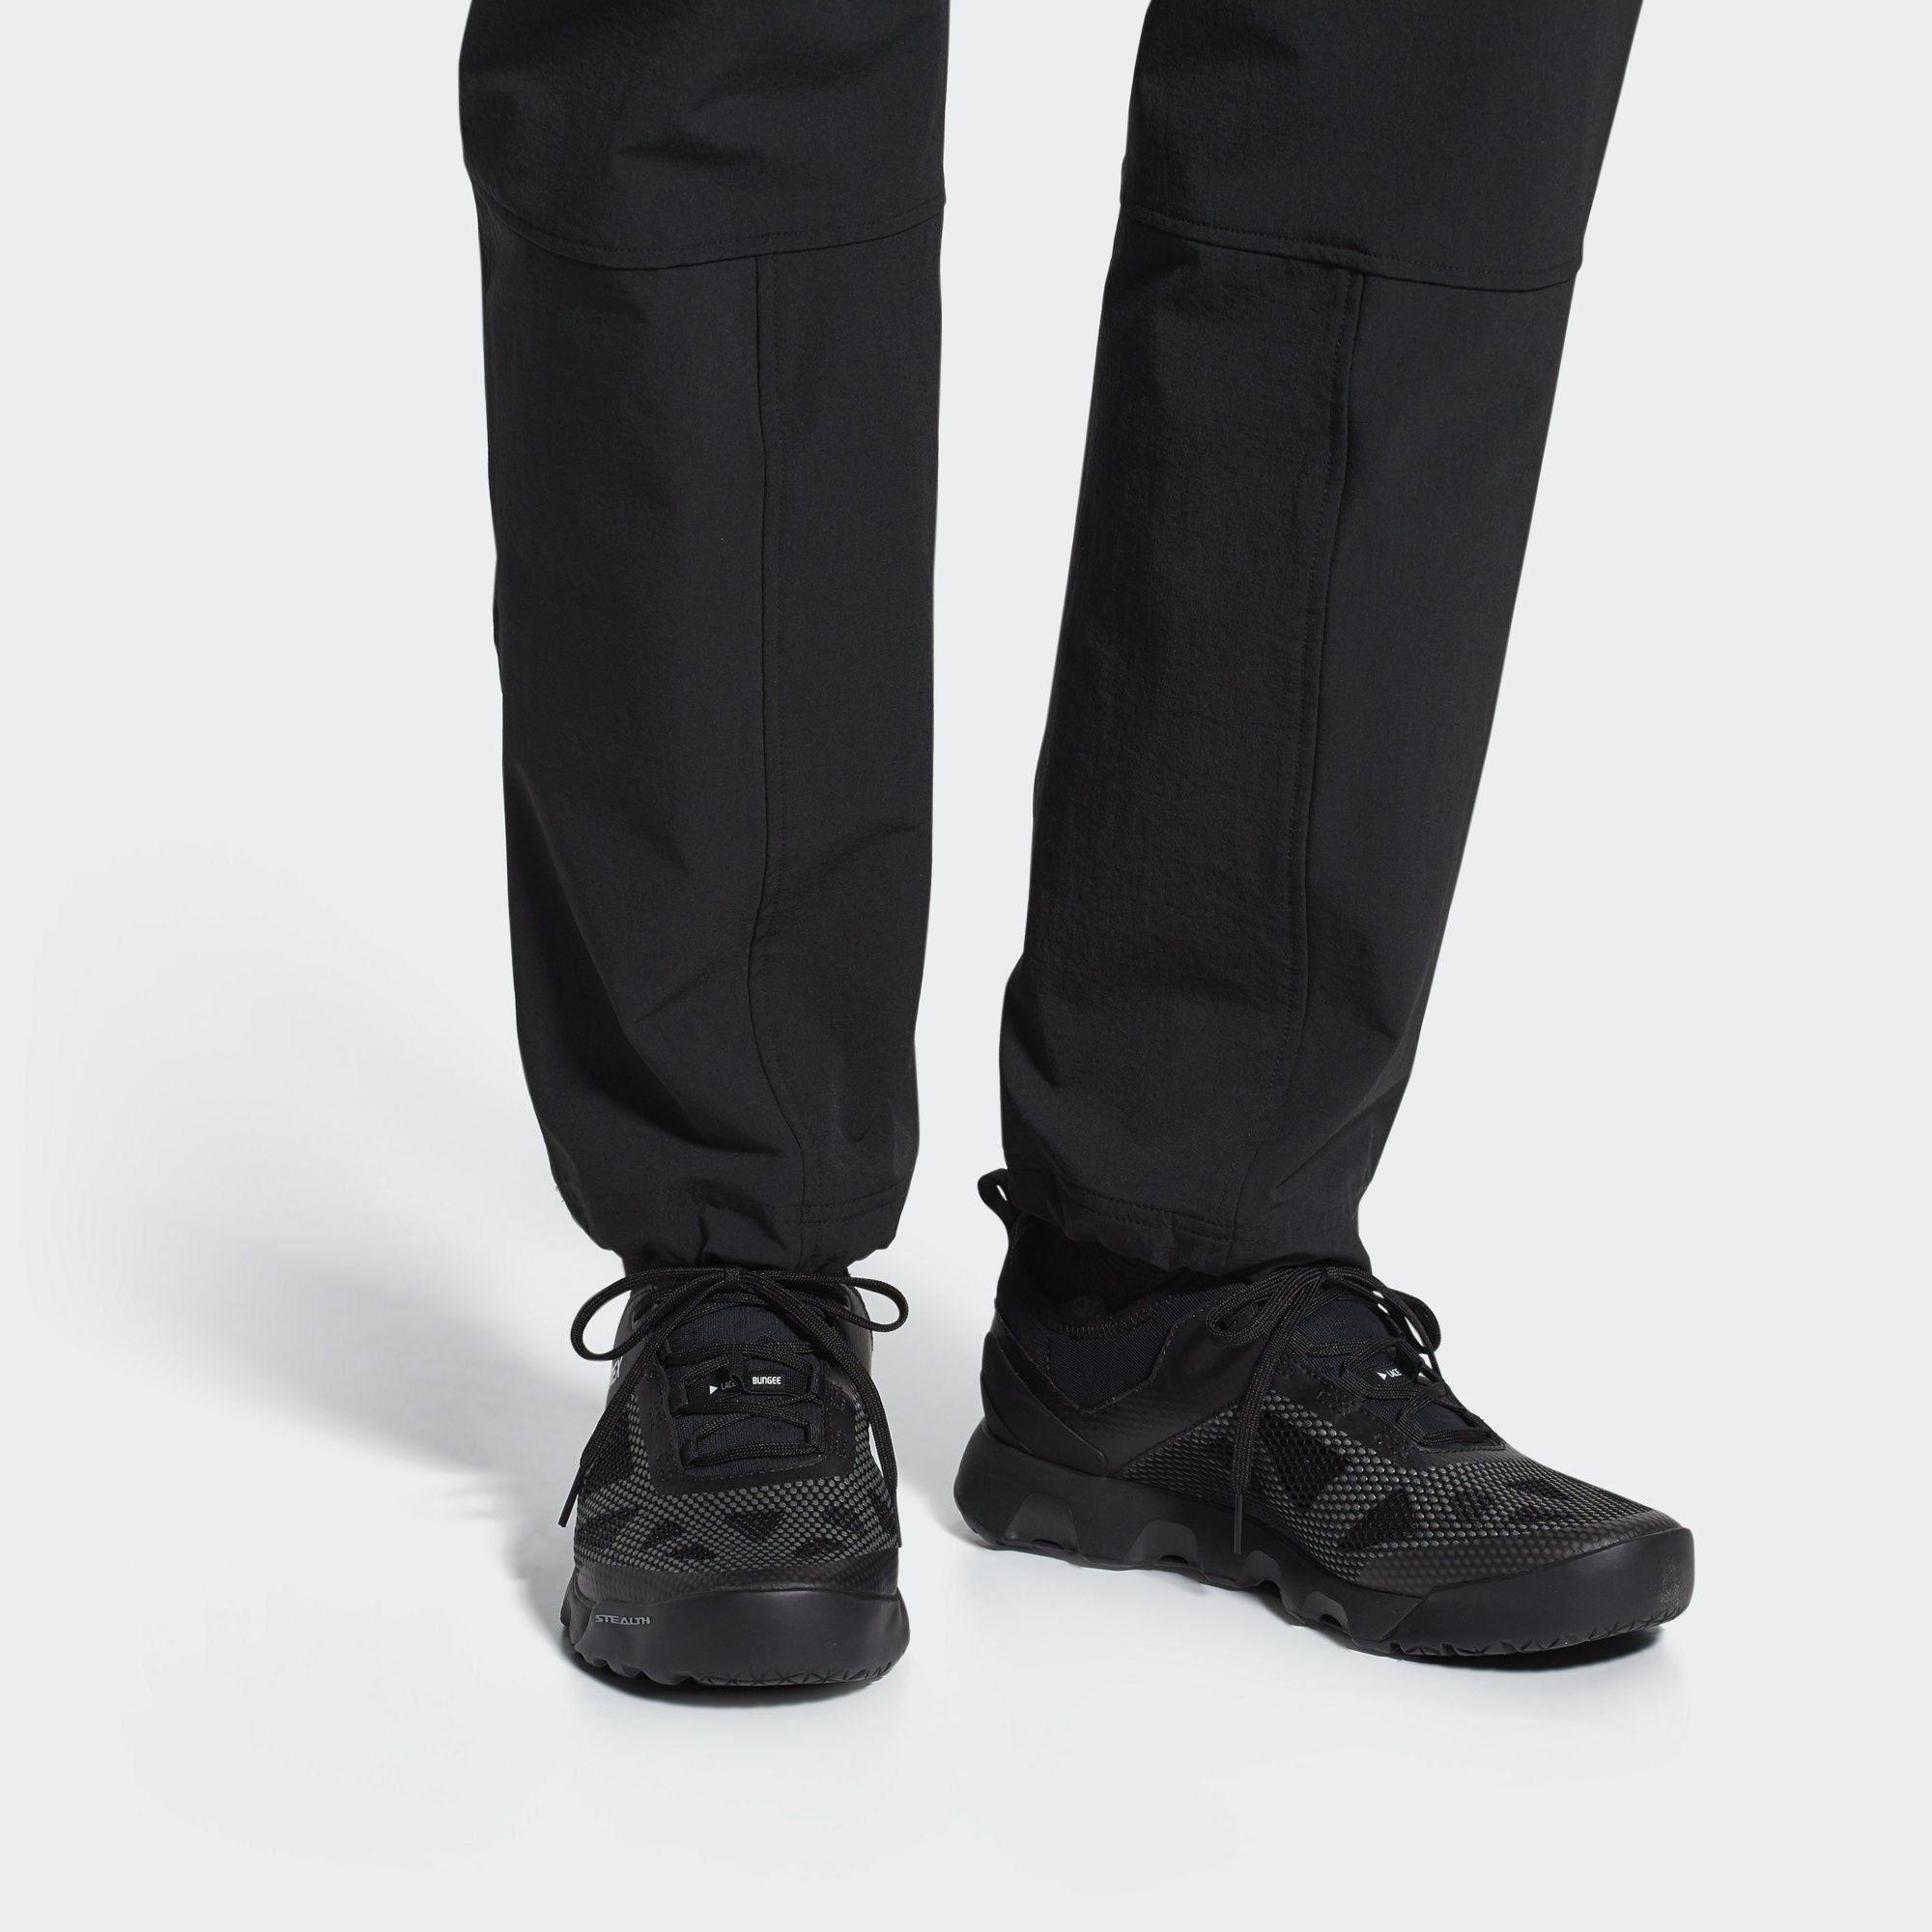 Black Artikel Online Schuh Fitnessschuh Kaufen Terrex Voyager Aqua 6924934699 Performance nr Adidas Climacool nw0AqZ1x7